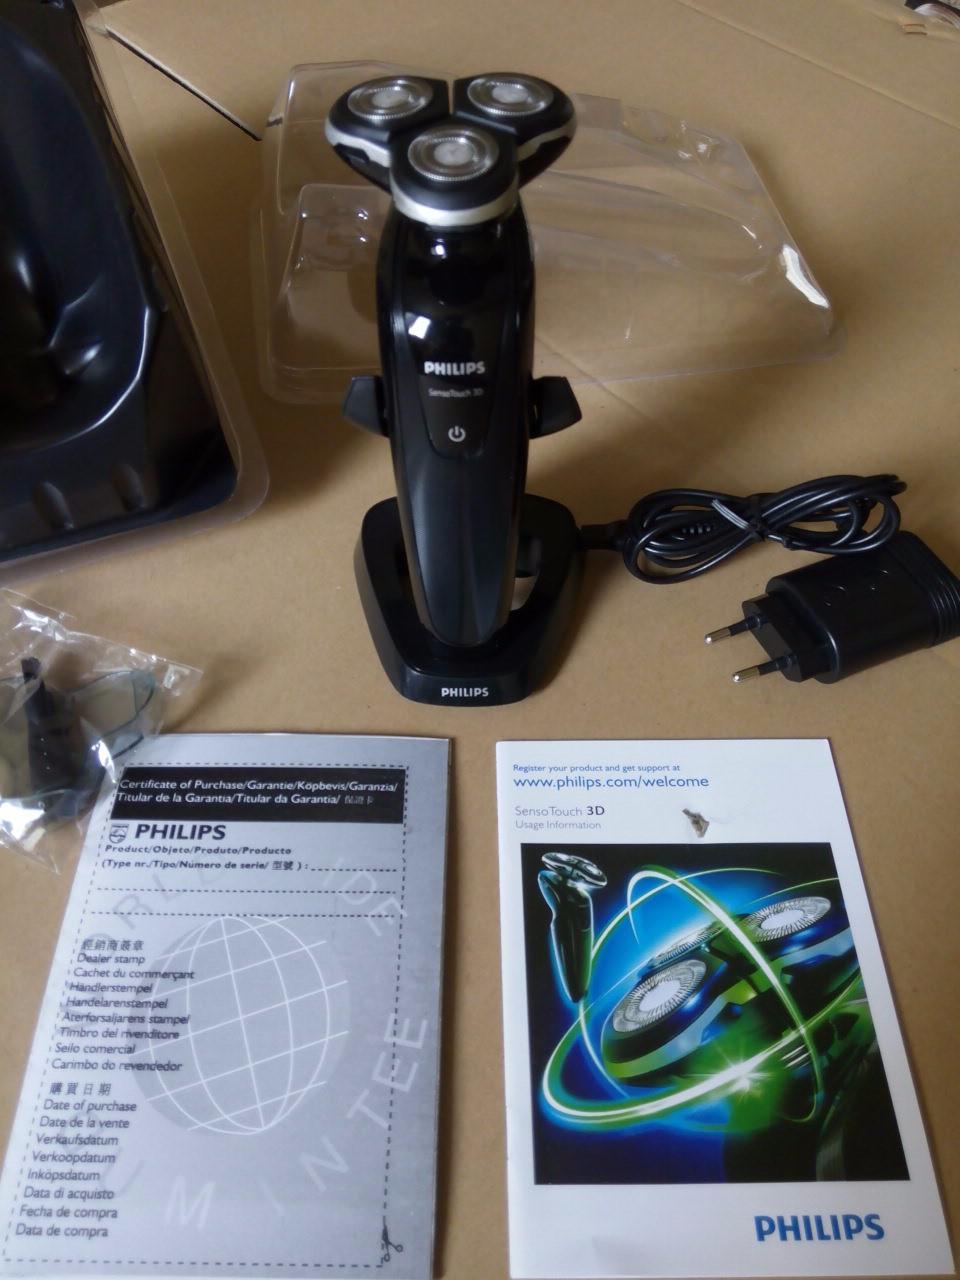 Rq1250 бритва электрическая бритва для мужчин аккумуляторная водонепроницаемый фото